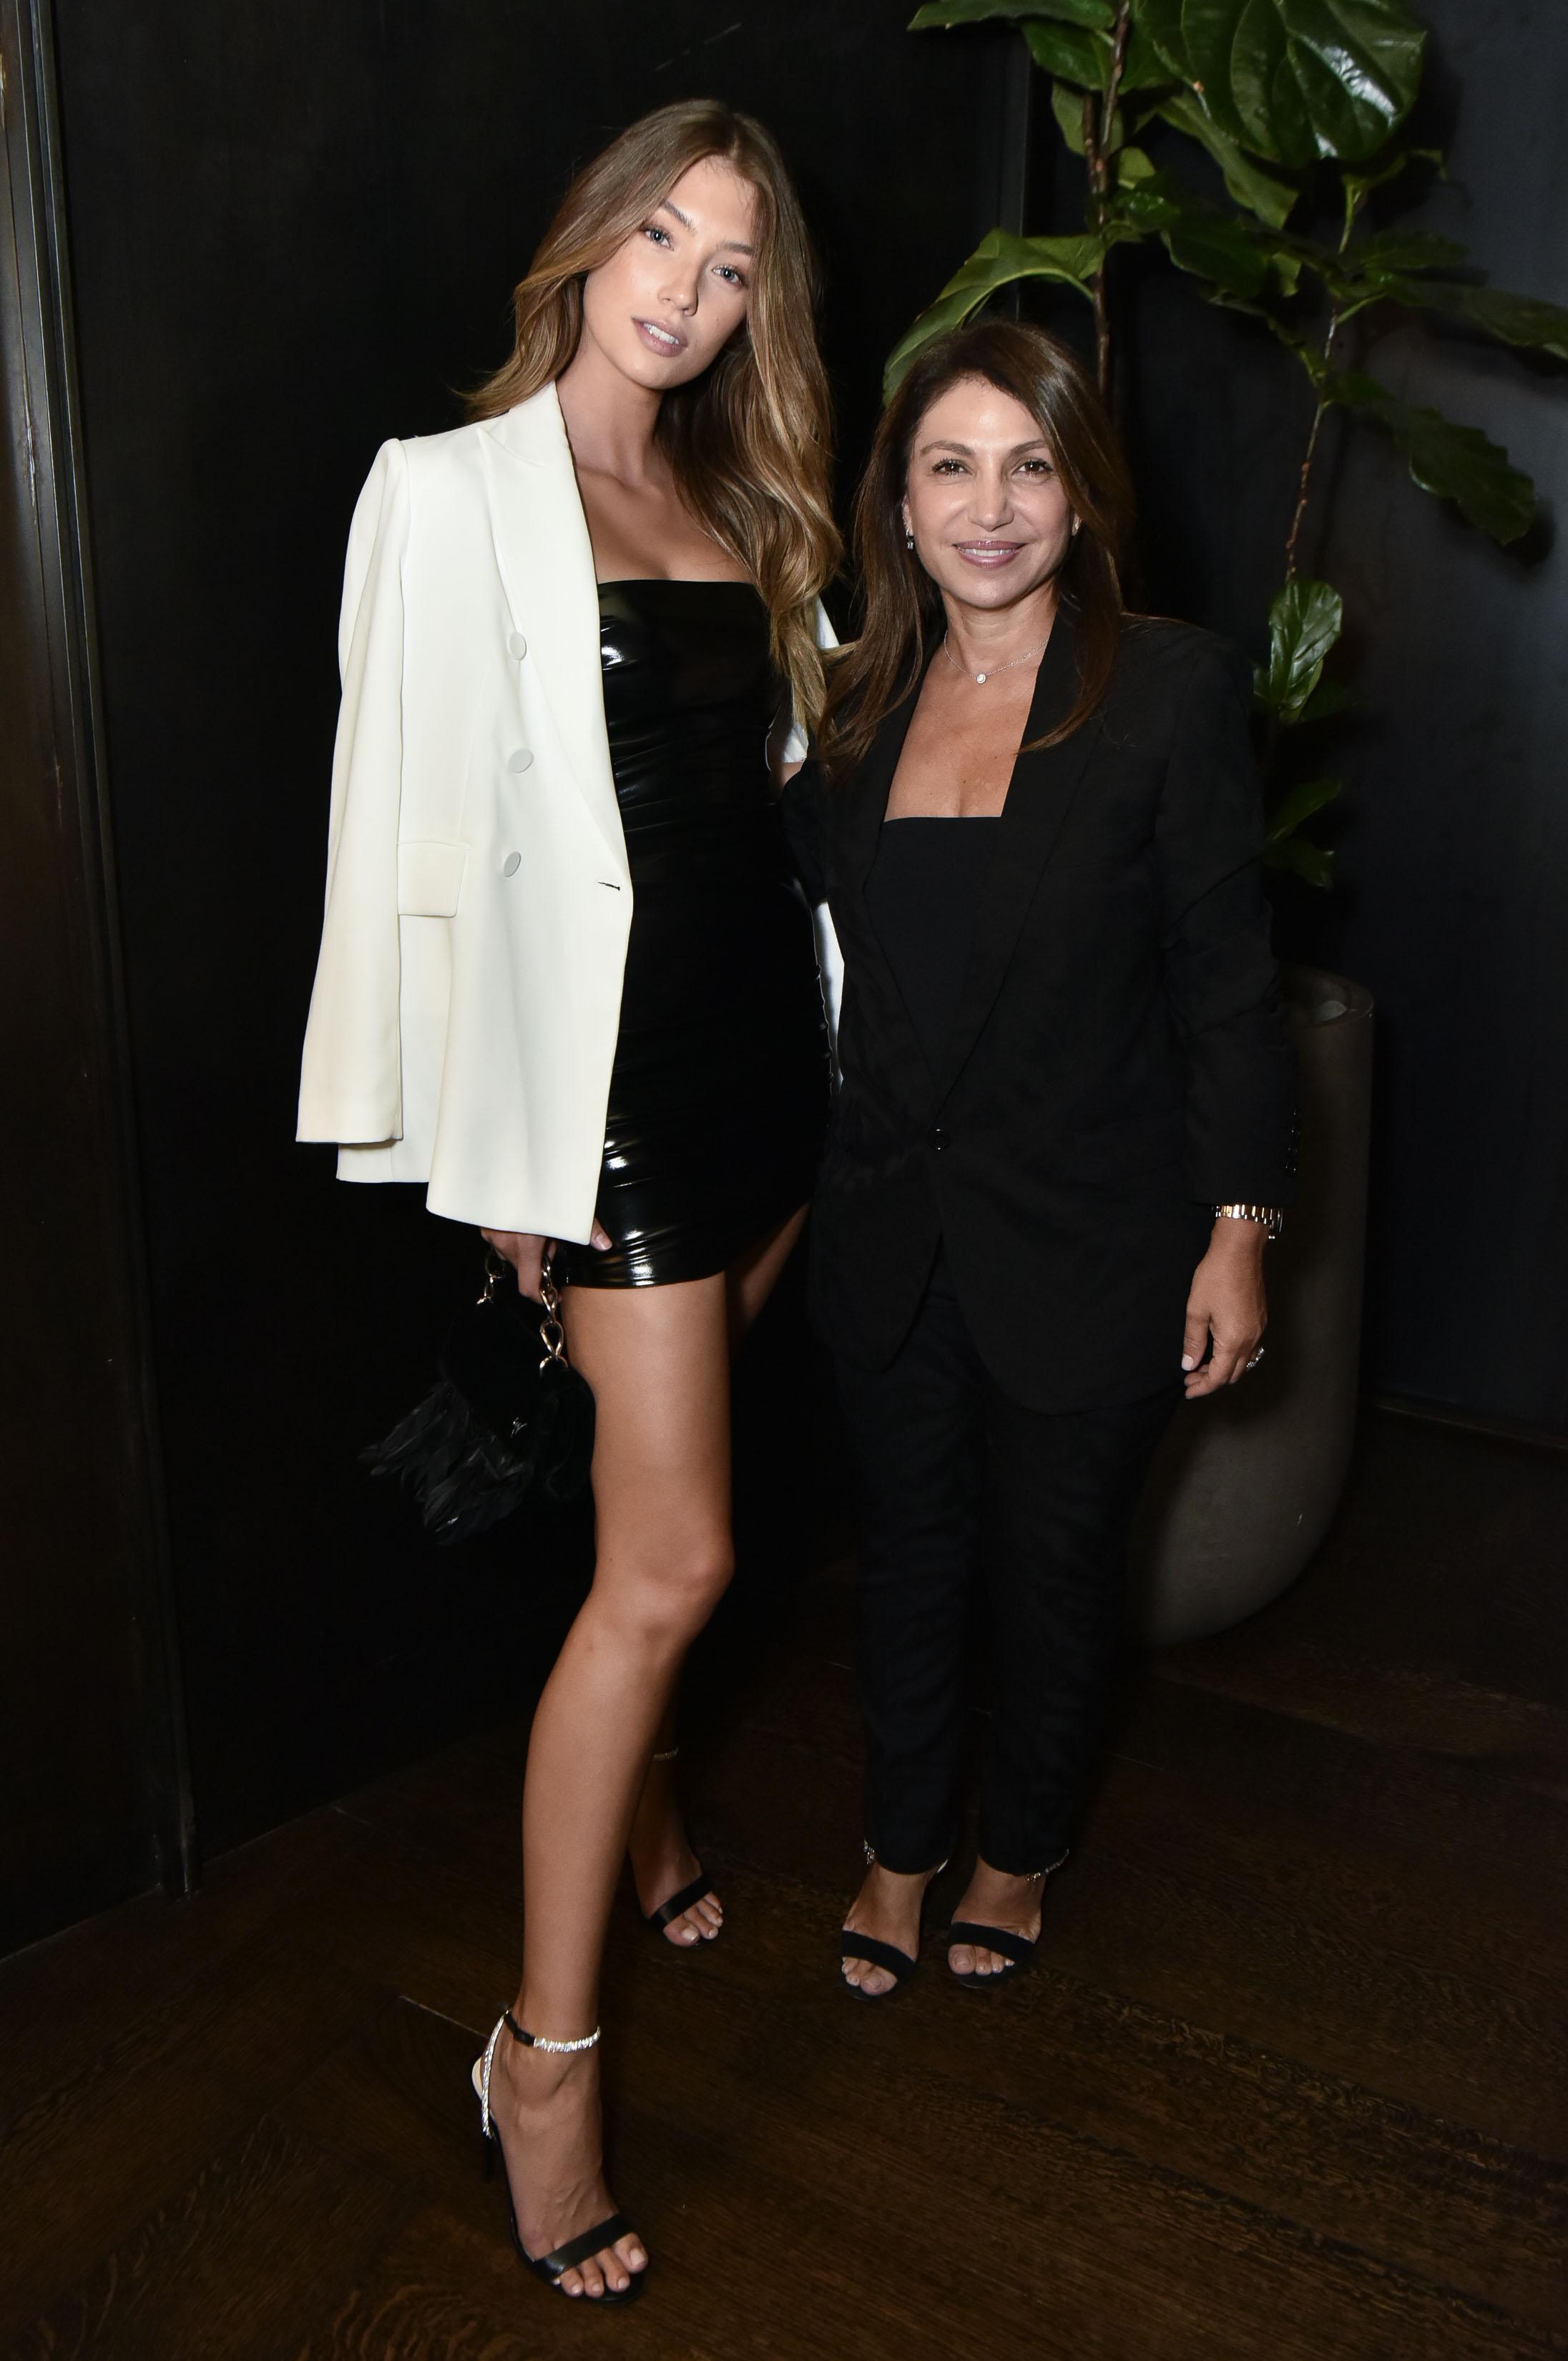 Lorena Rae attends Alevi Milano NYFW Dinner